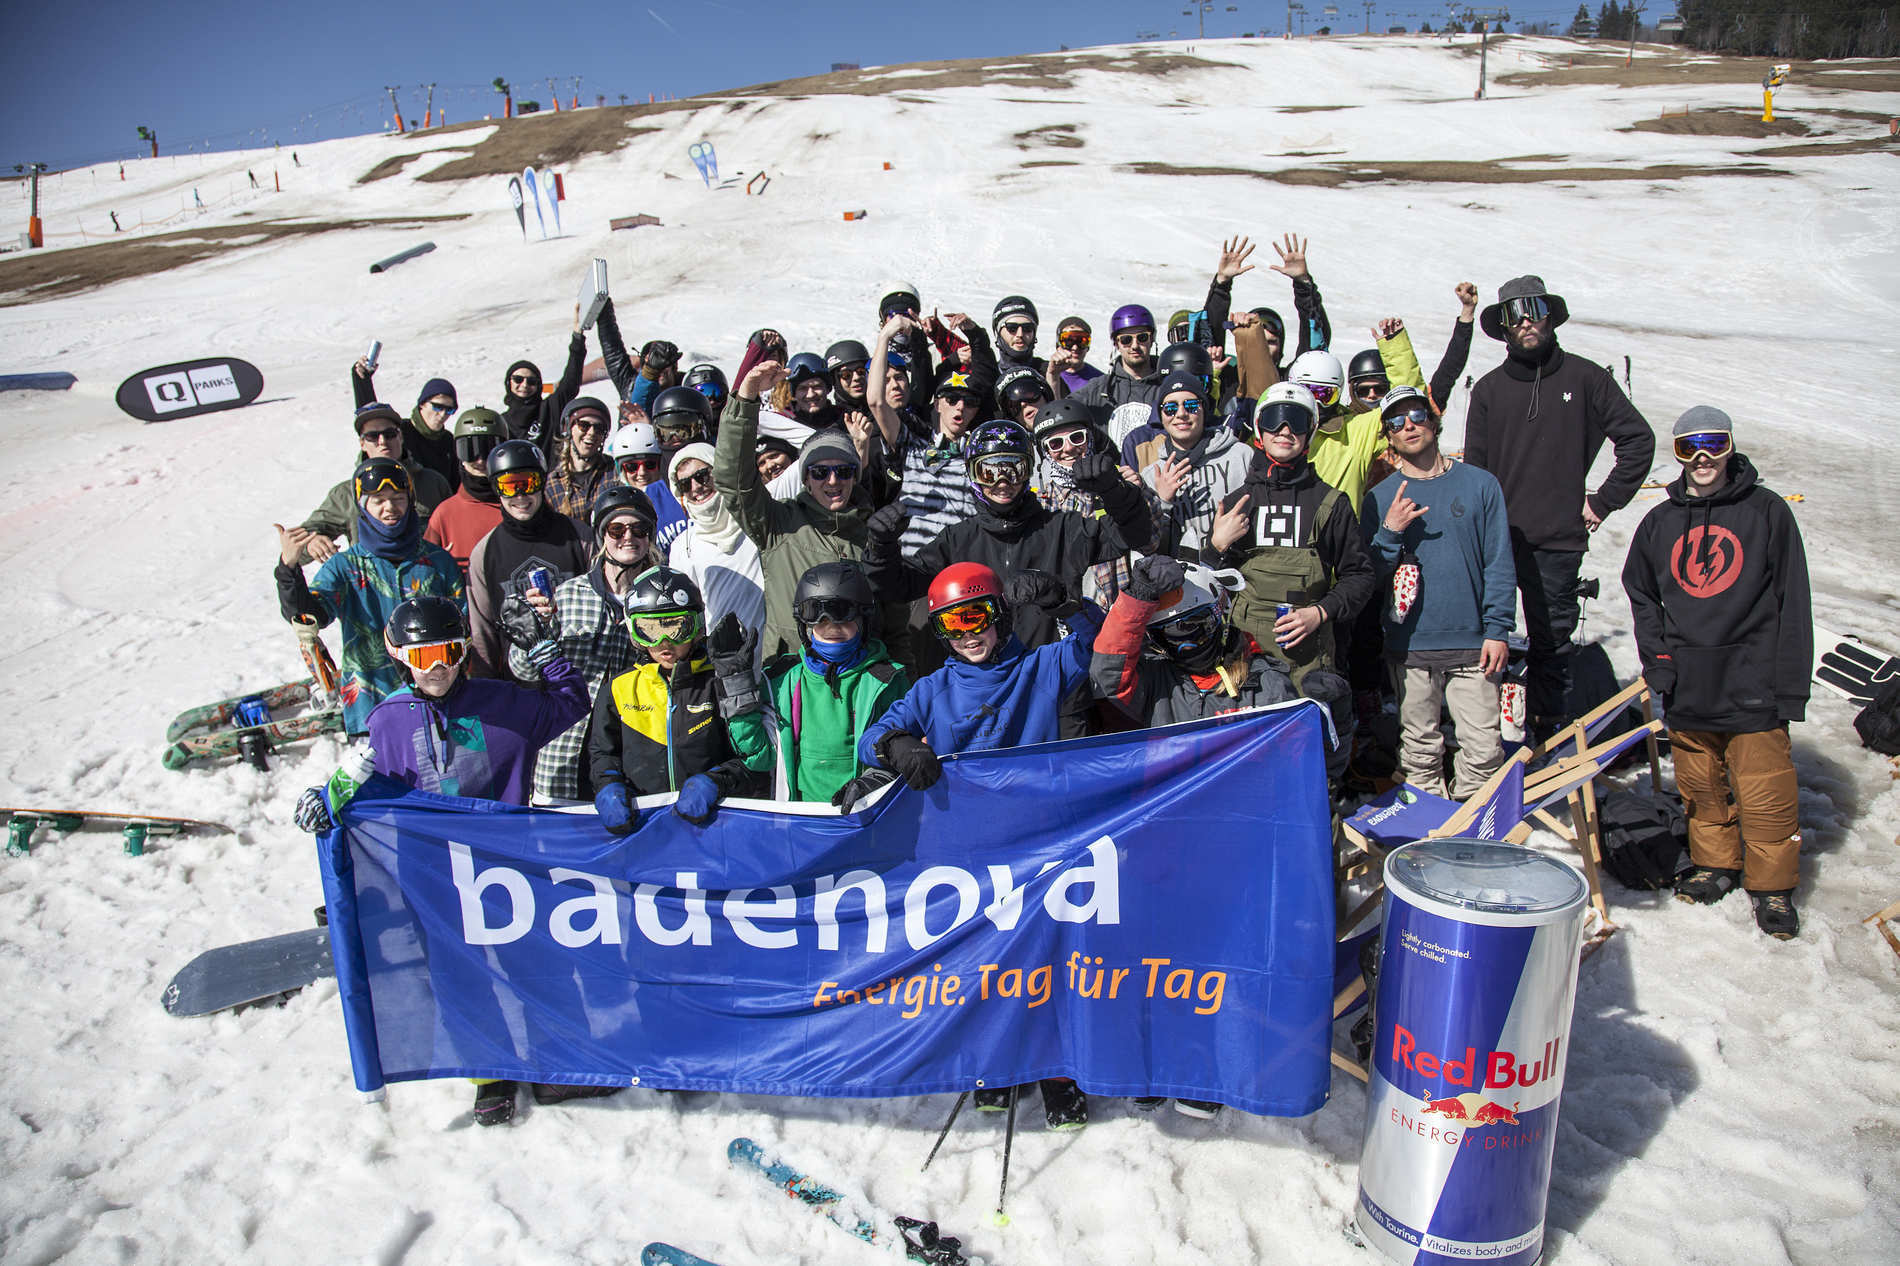 web snowpark feldberg 25 03 2017 lifestyle fs sb martin herrmann qparks 20